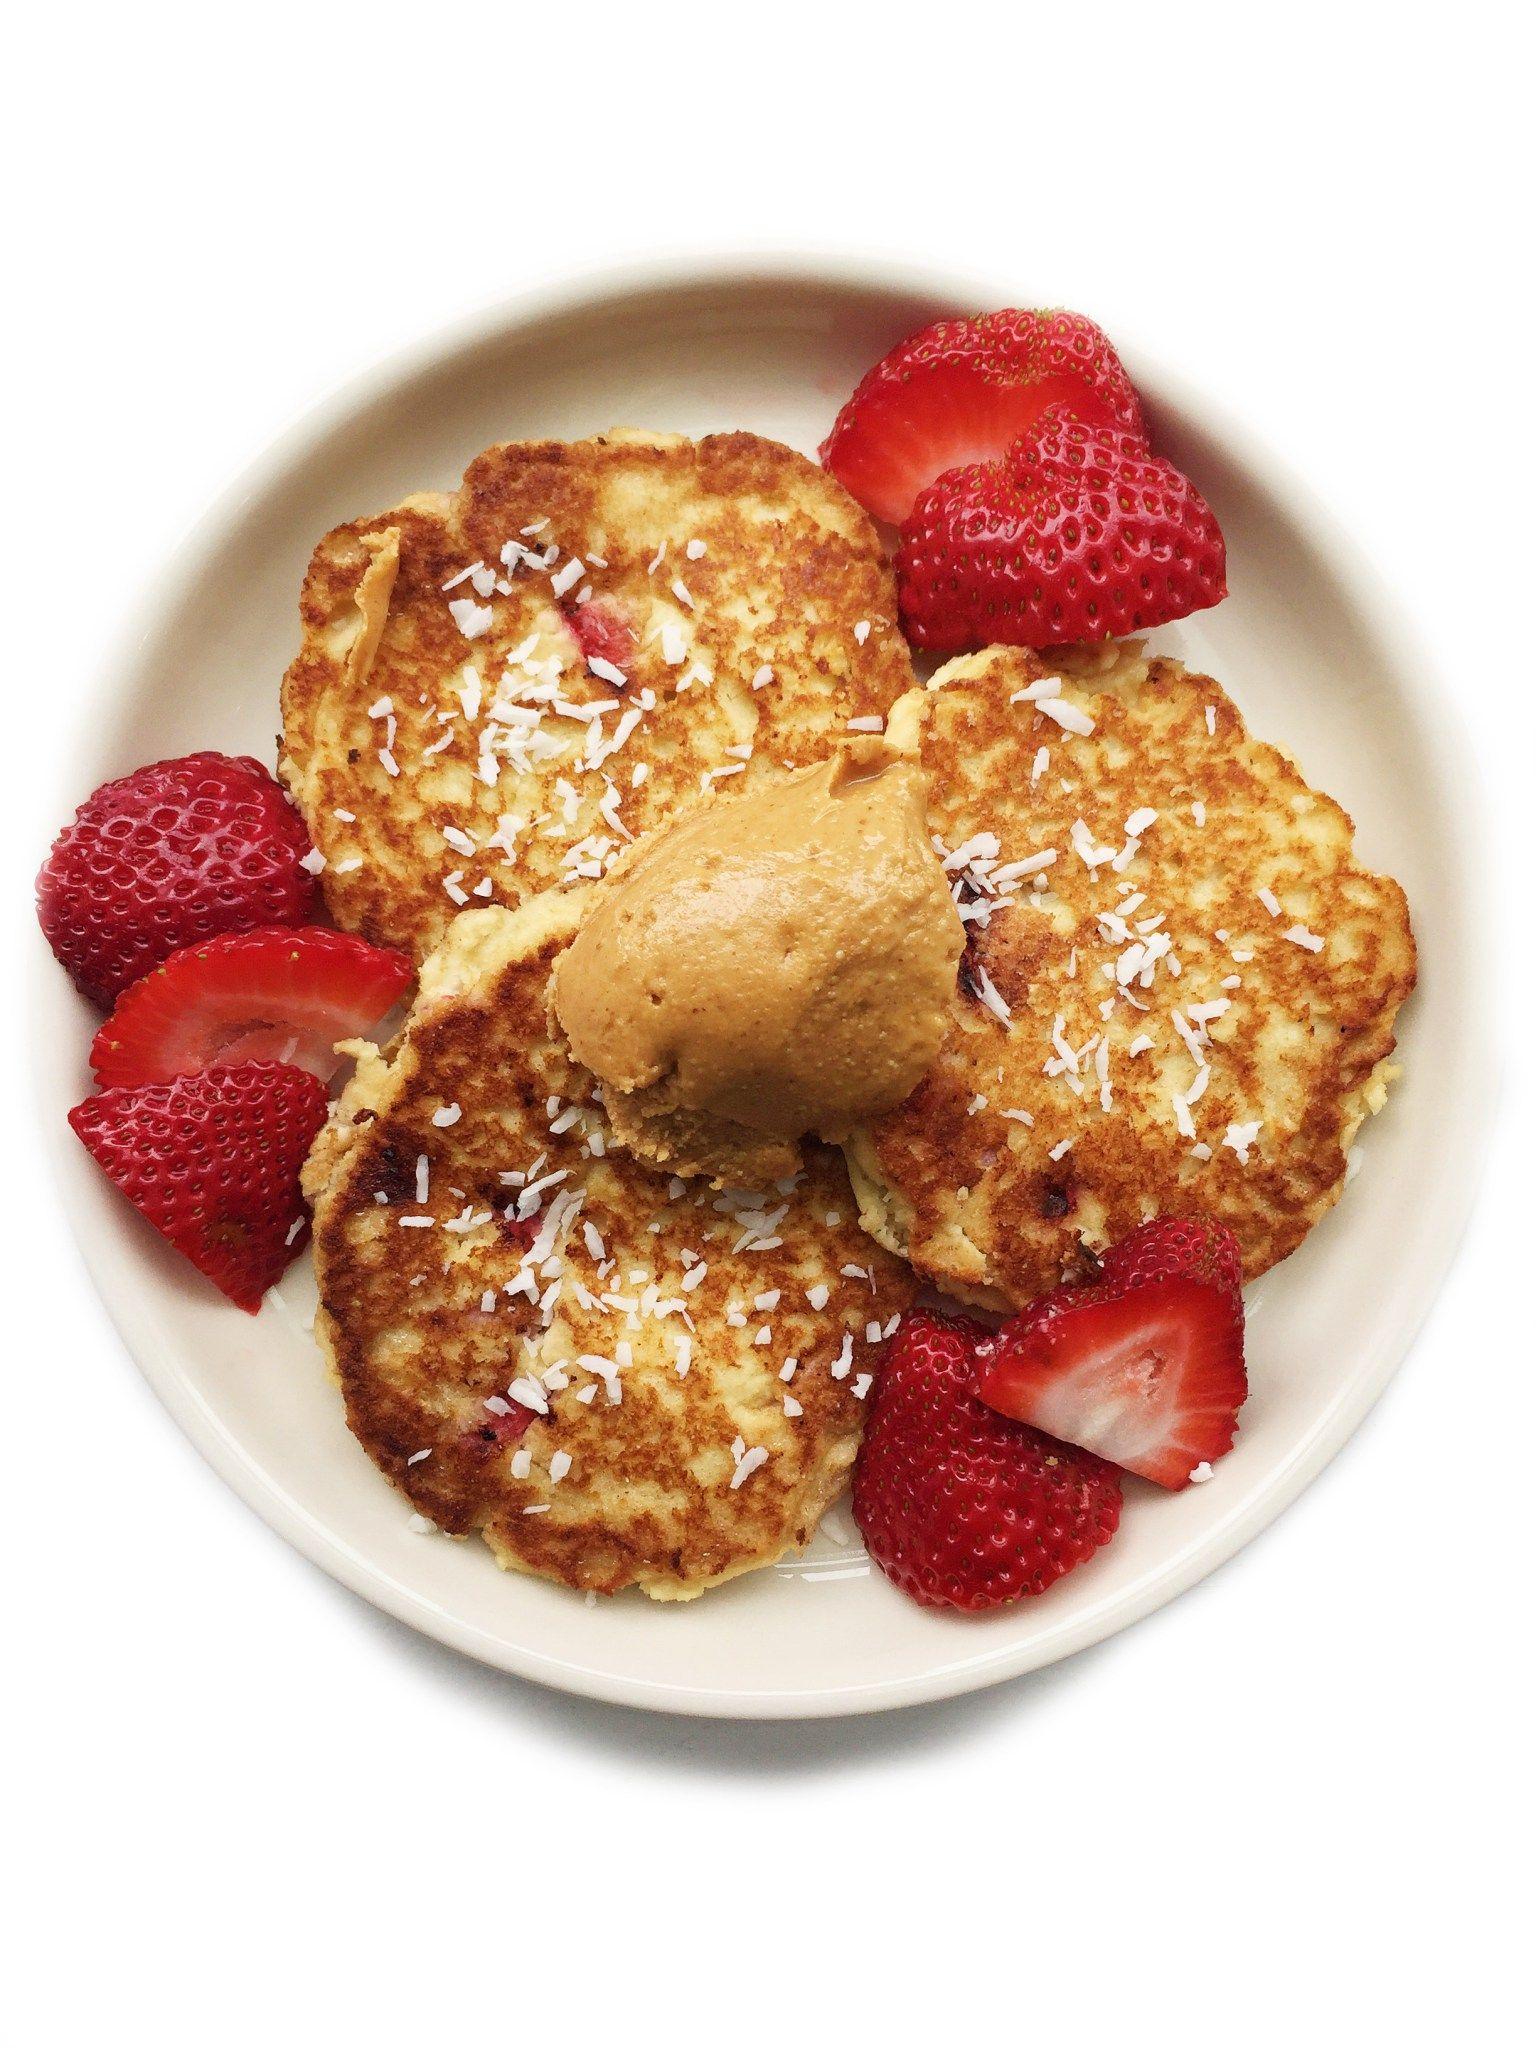 paleostrawberrycoconutpancakes